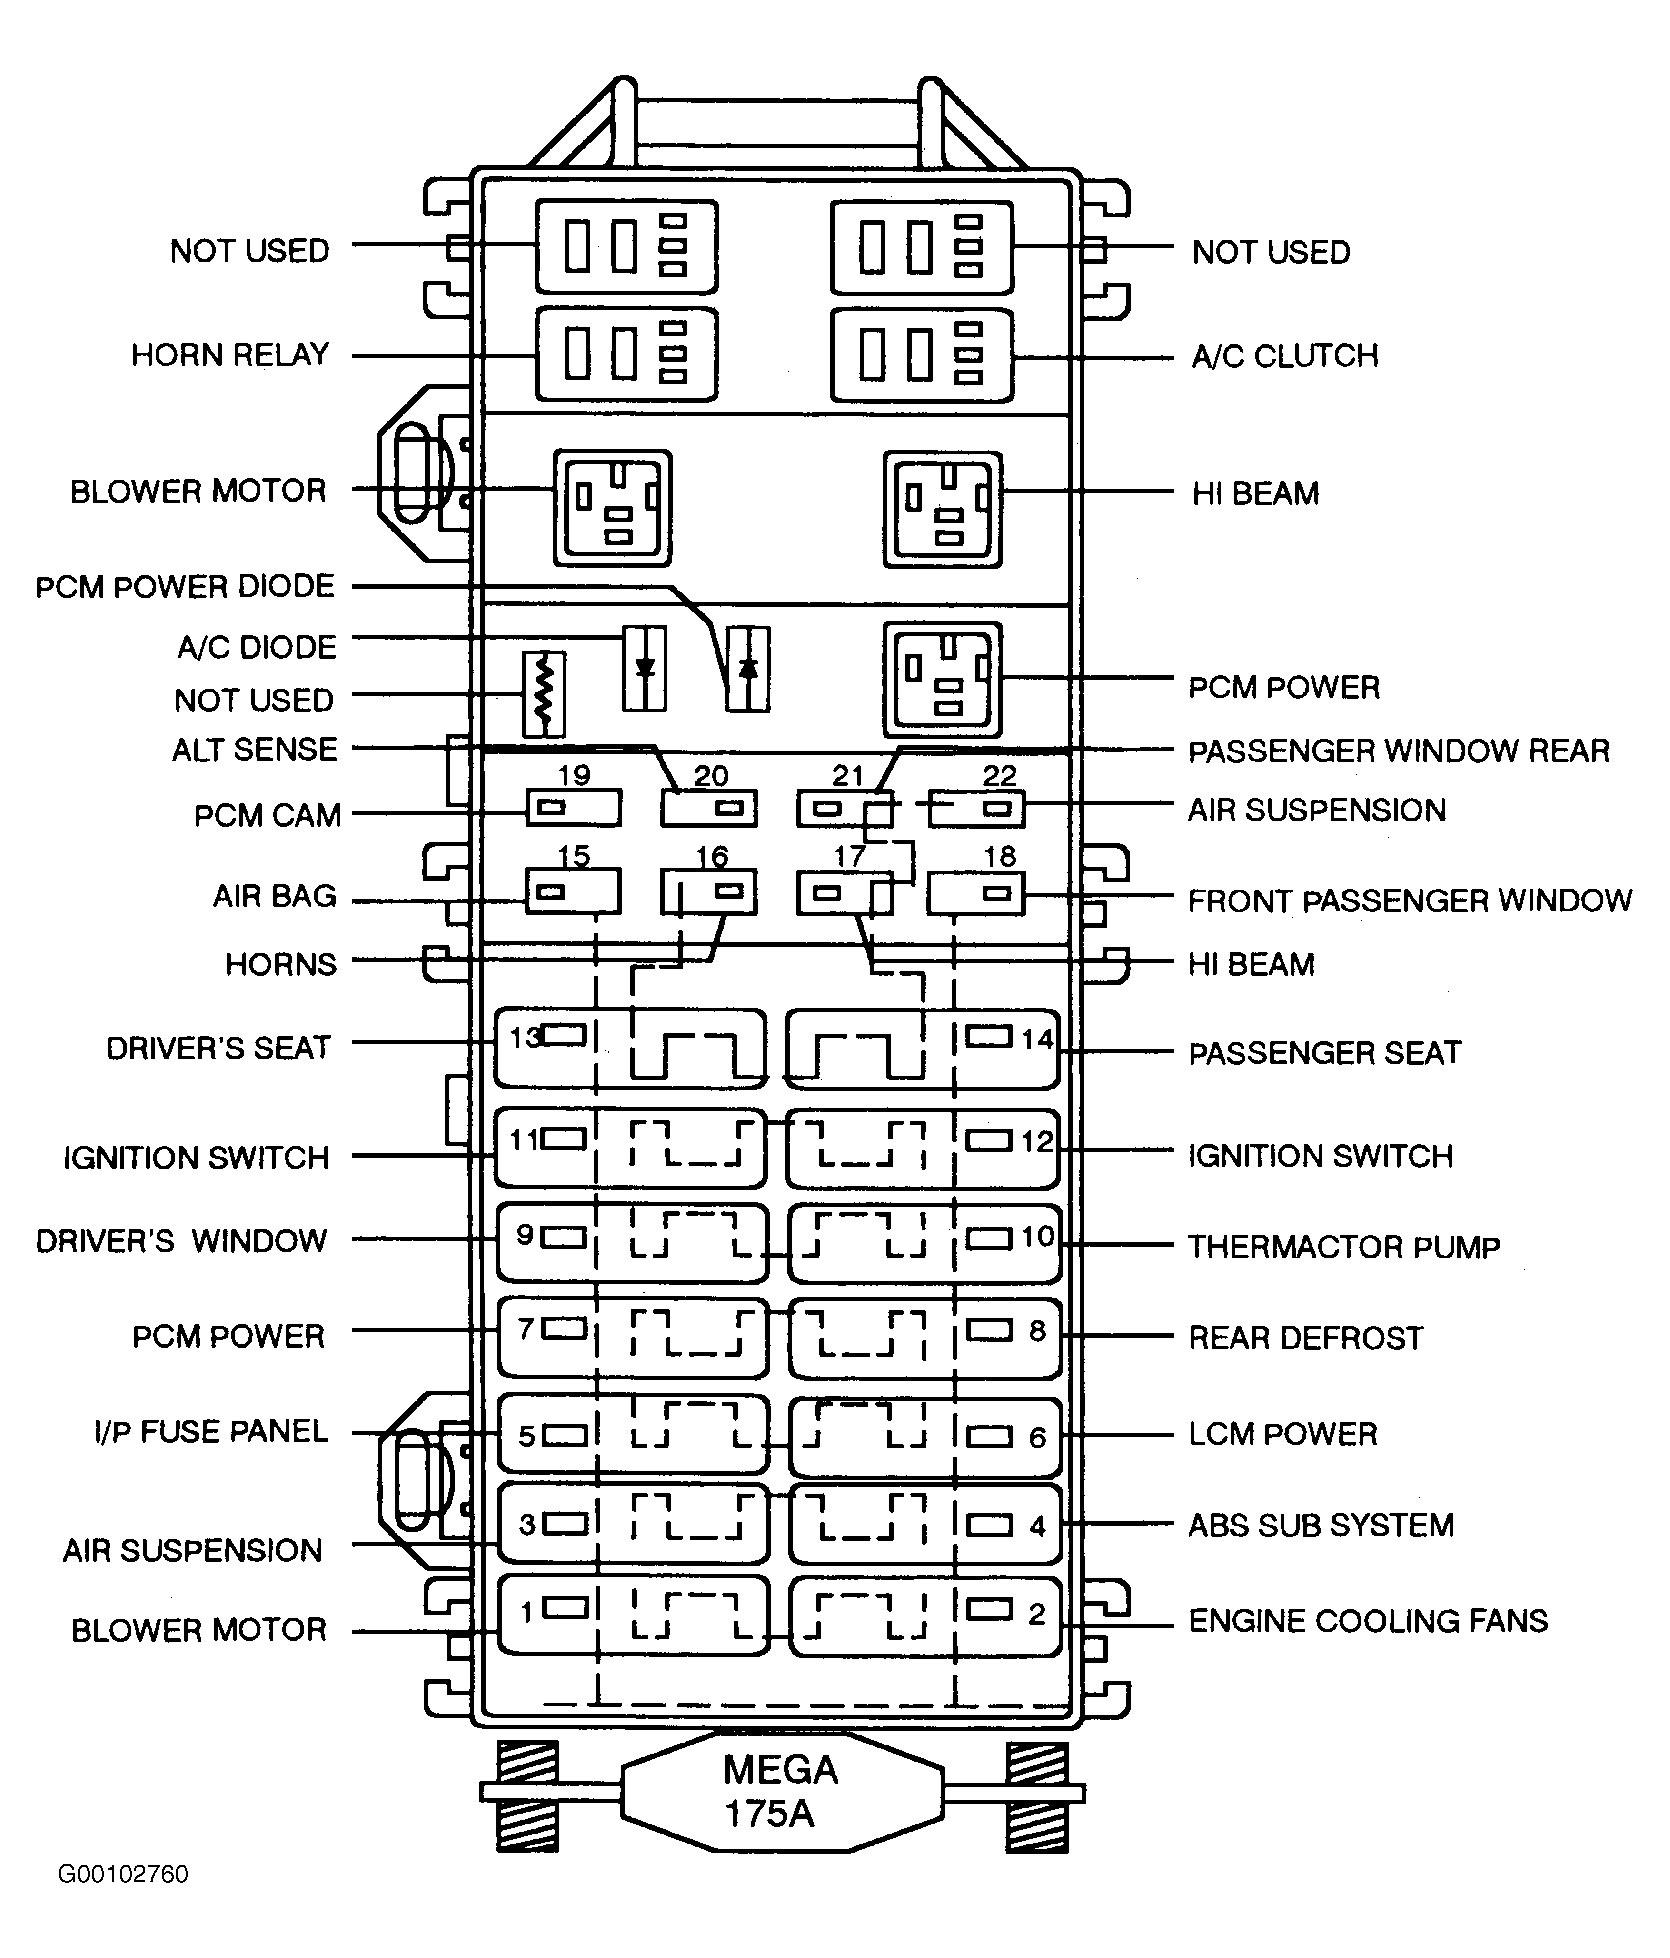 2002 Chevrolet Prizm Under Dash Fuse Box Diagram Wiring